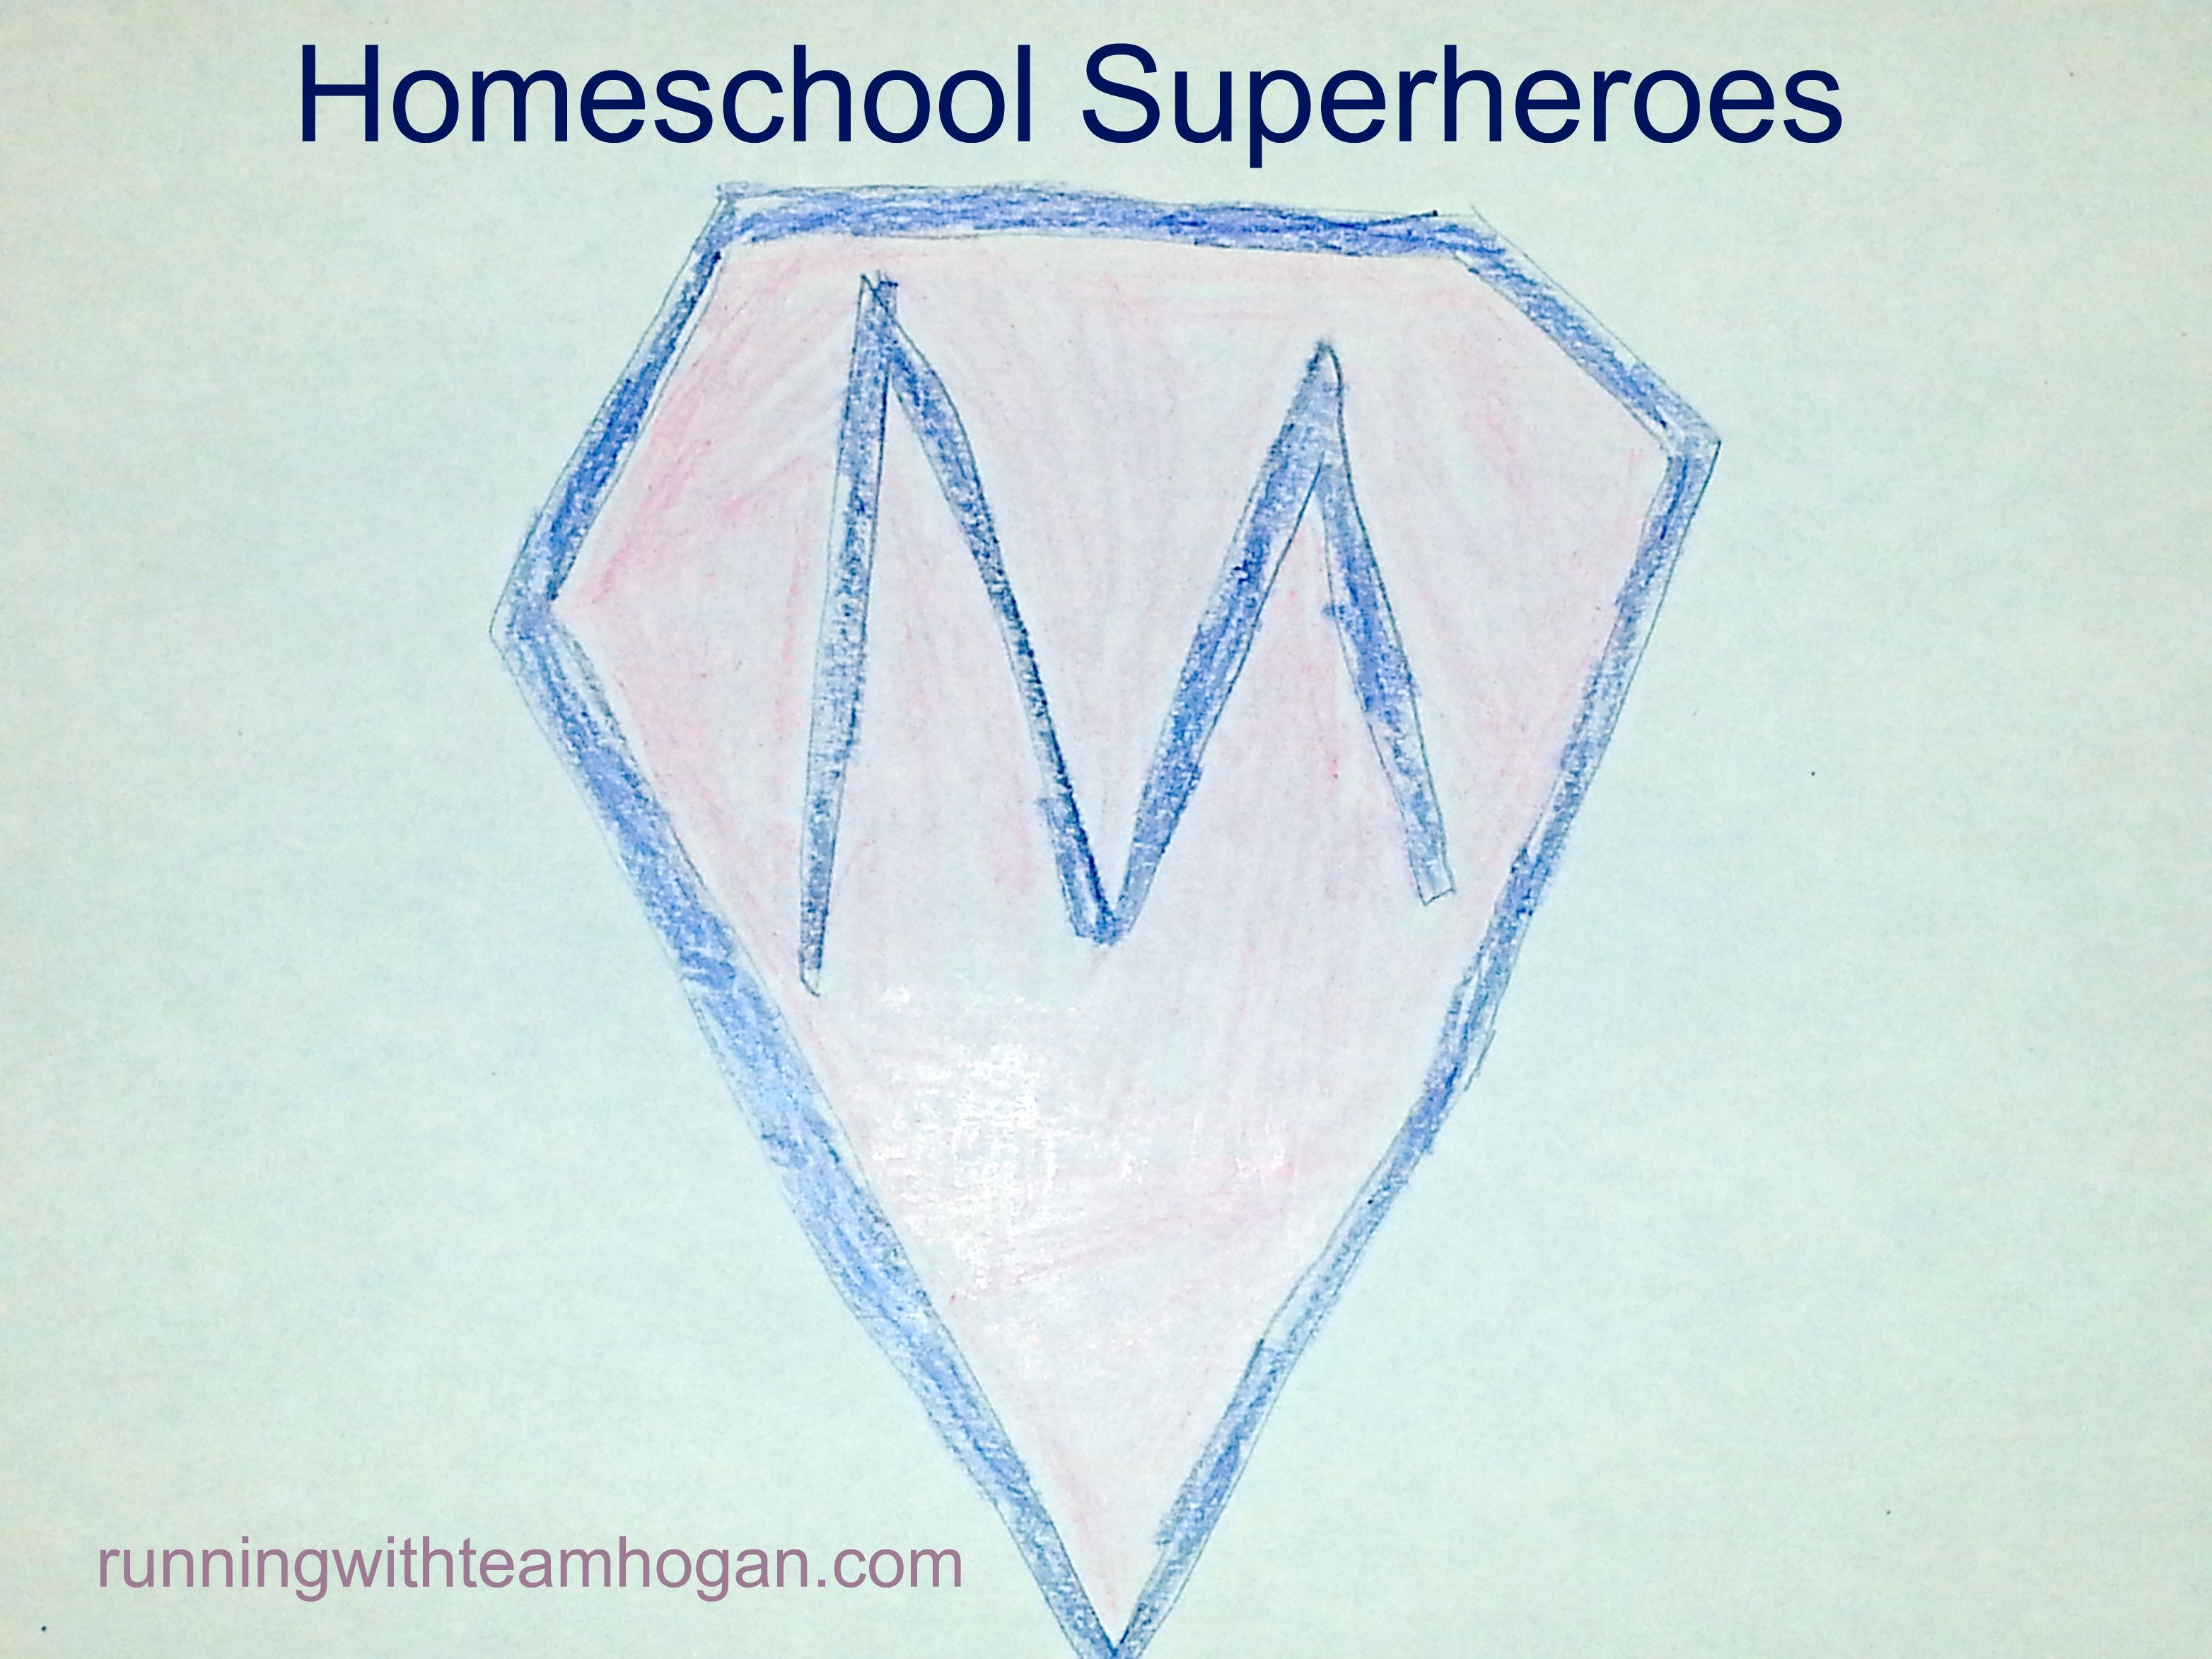 Homeschool Superheroes